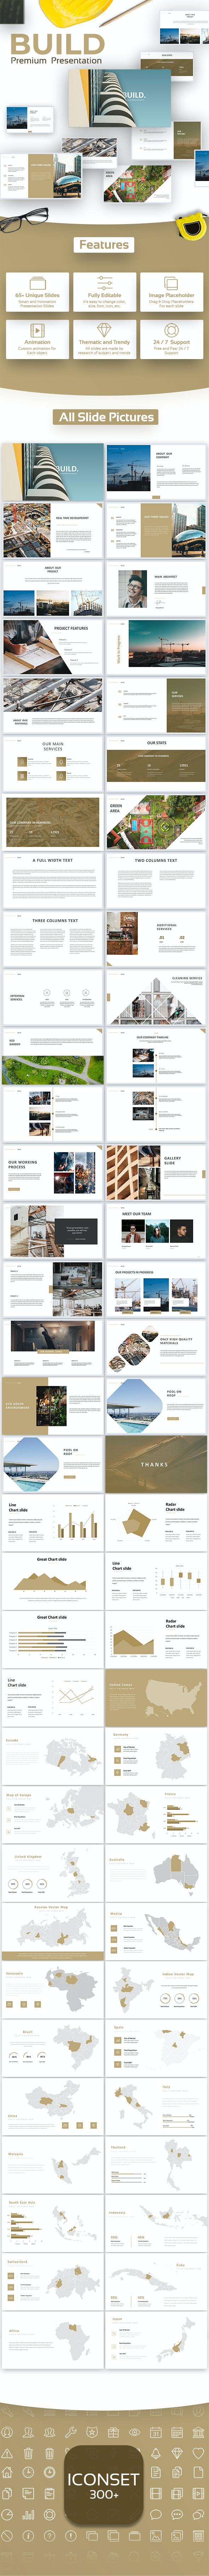 Build - Development Powerpoint Presentation - Business PowerPoint Templates